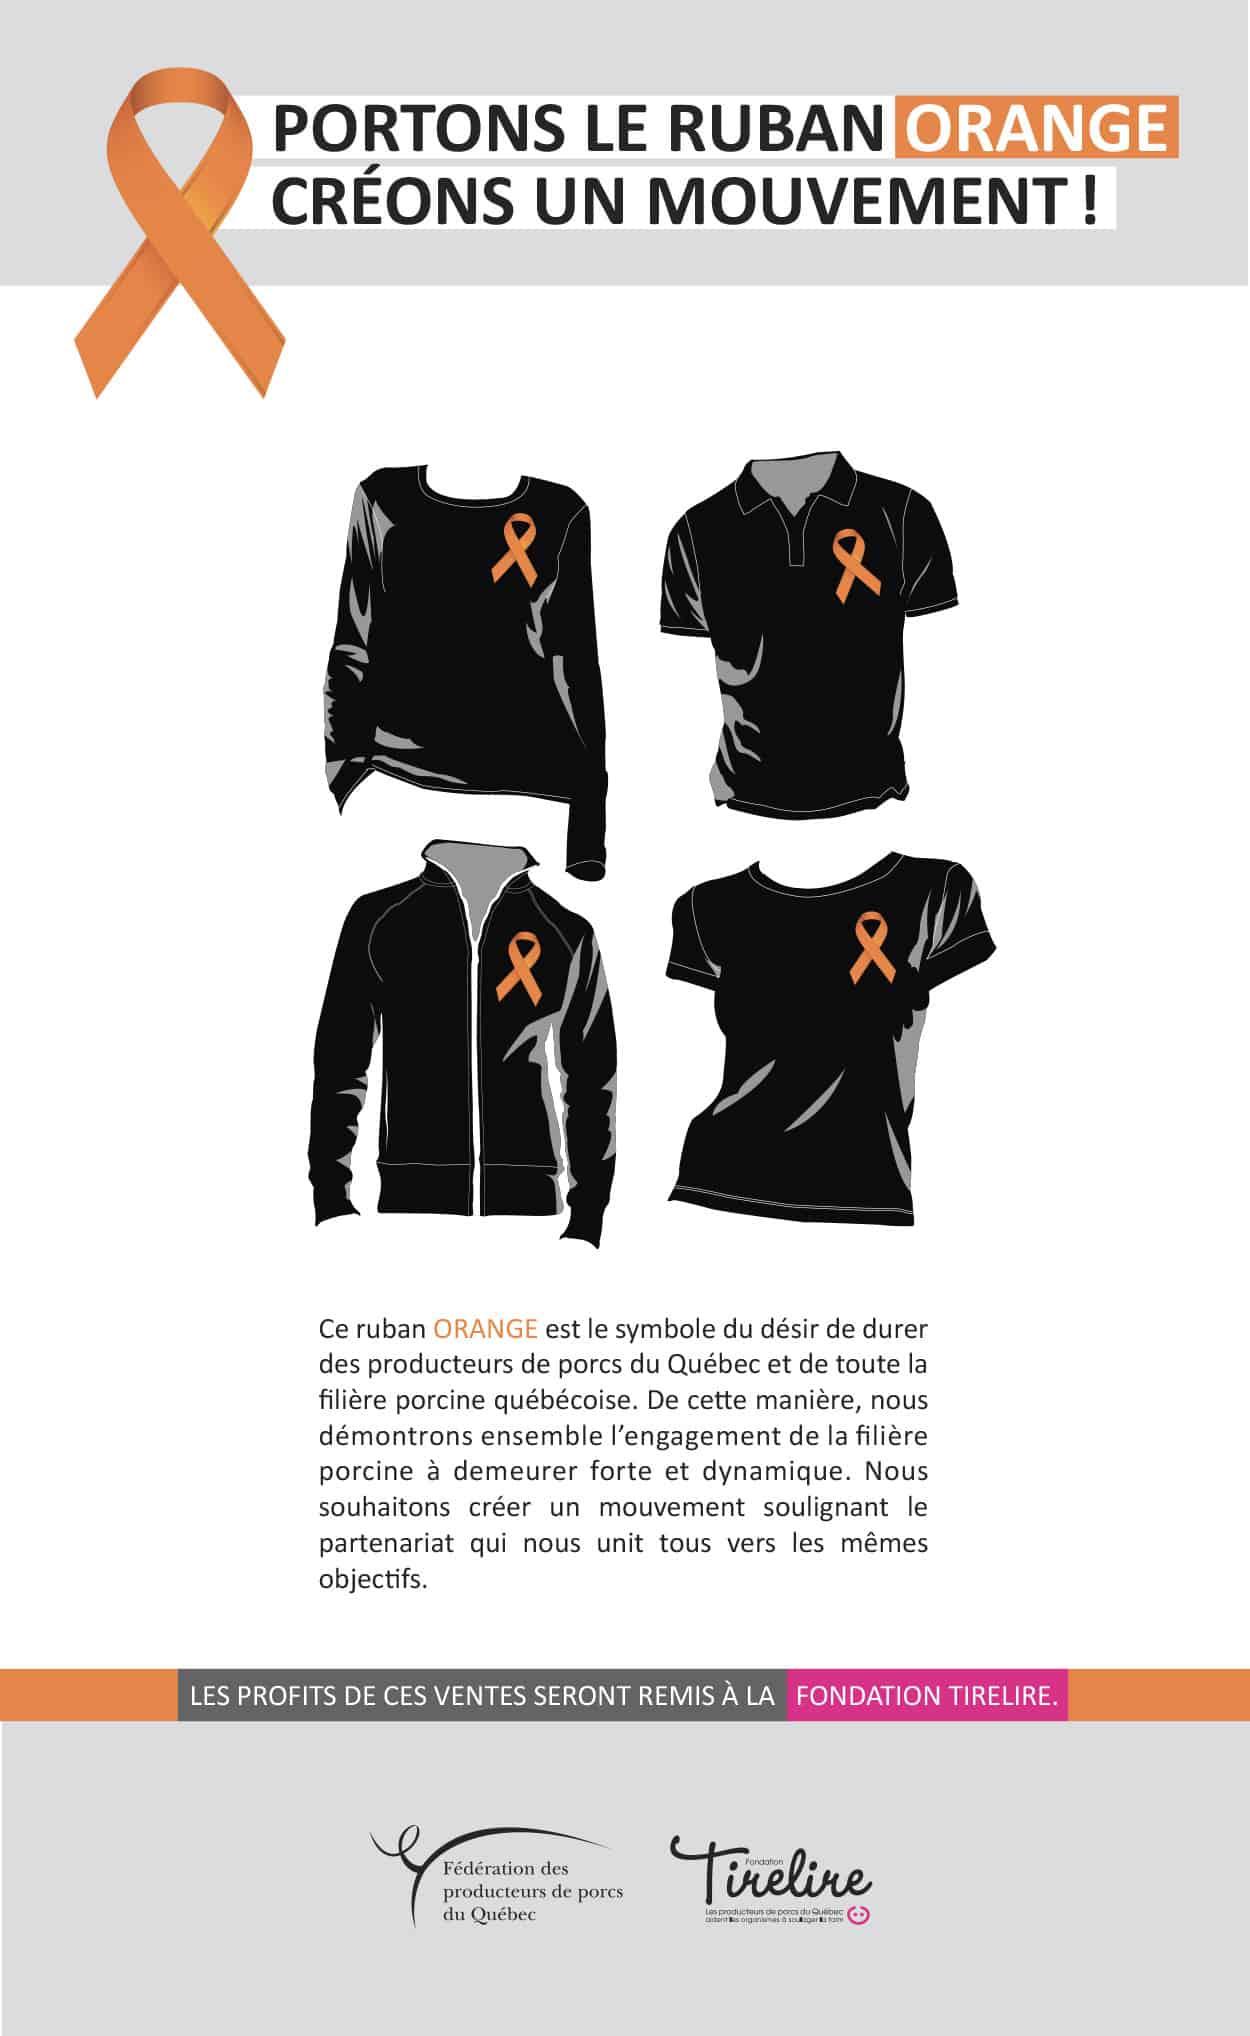 Affiche de la Fondation tirelire - ruban orange